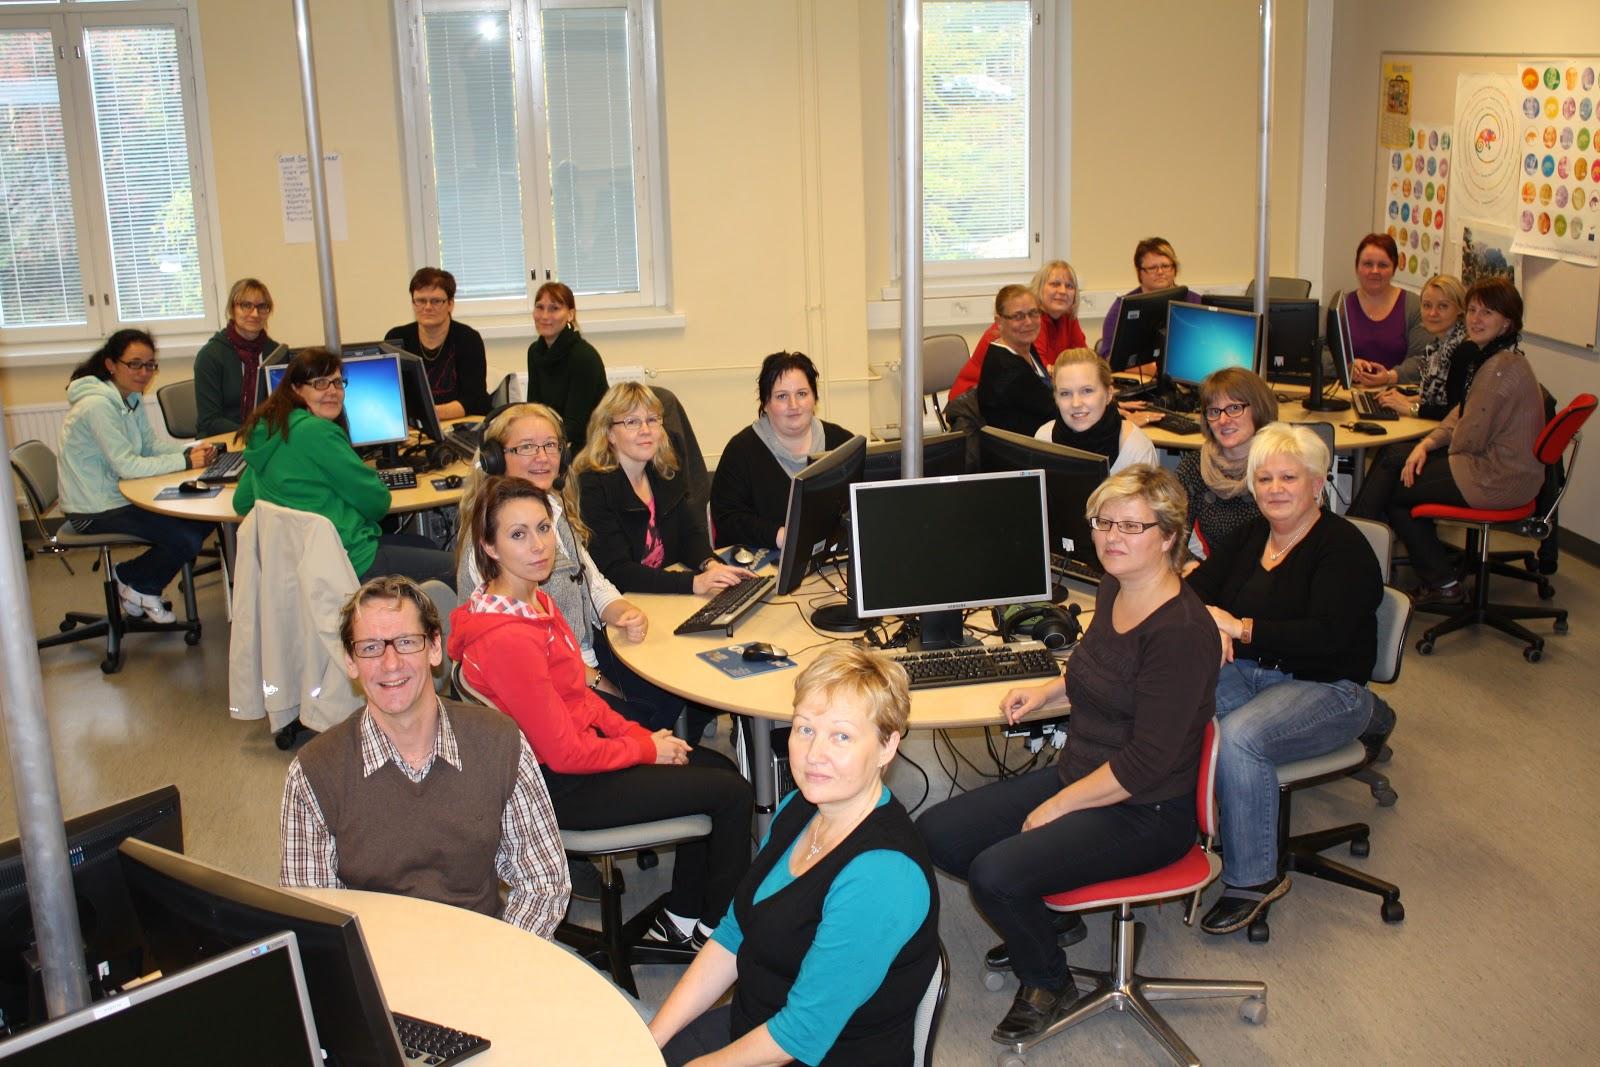 verkko opiskelu sosiaali ja terveysala Hameenlinna